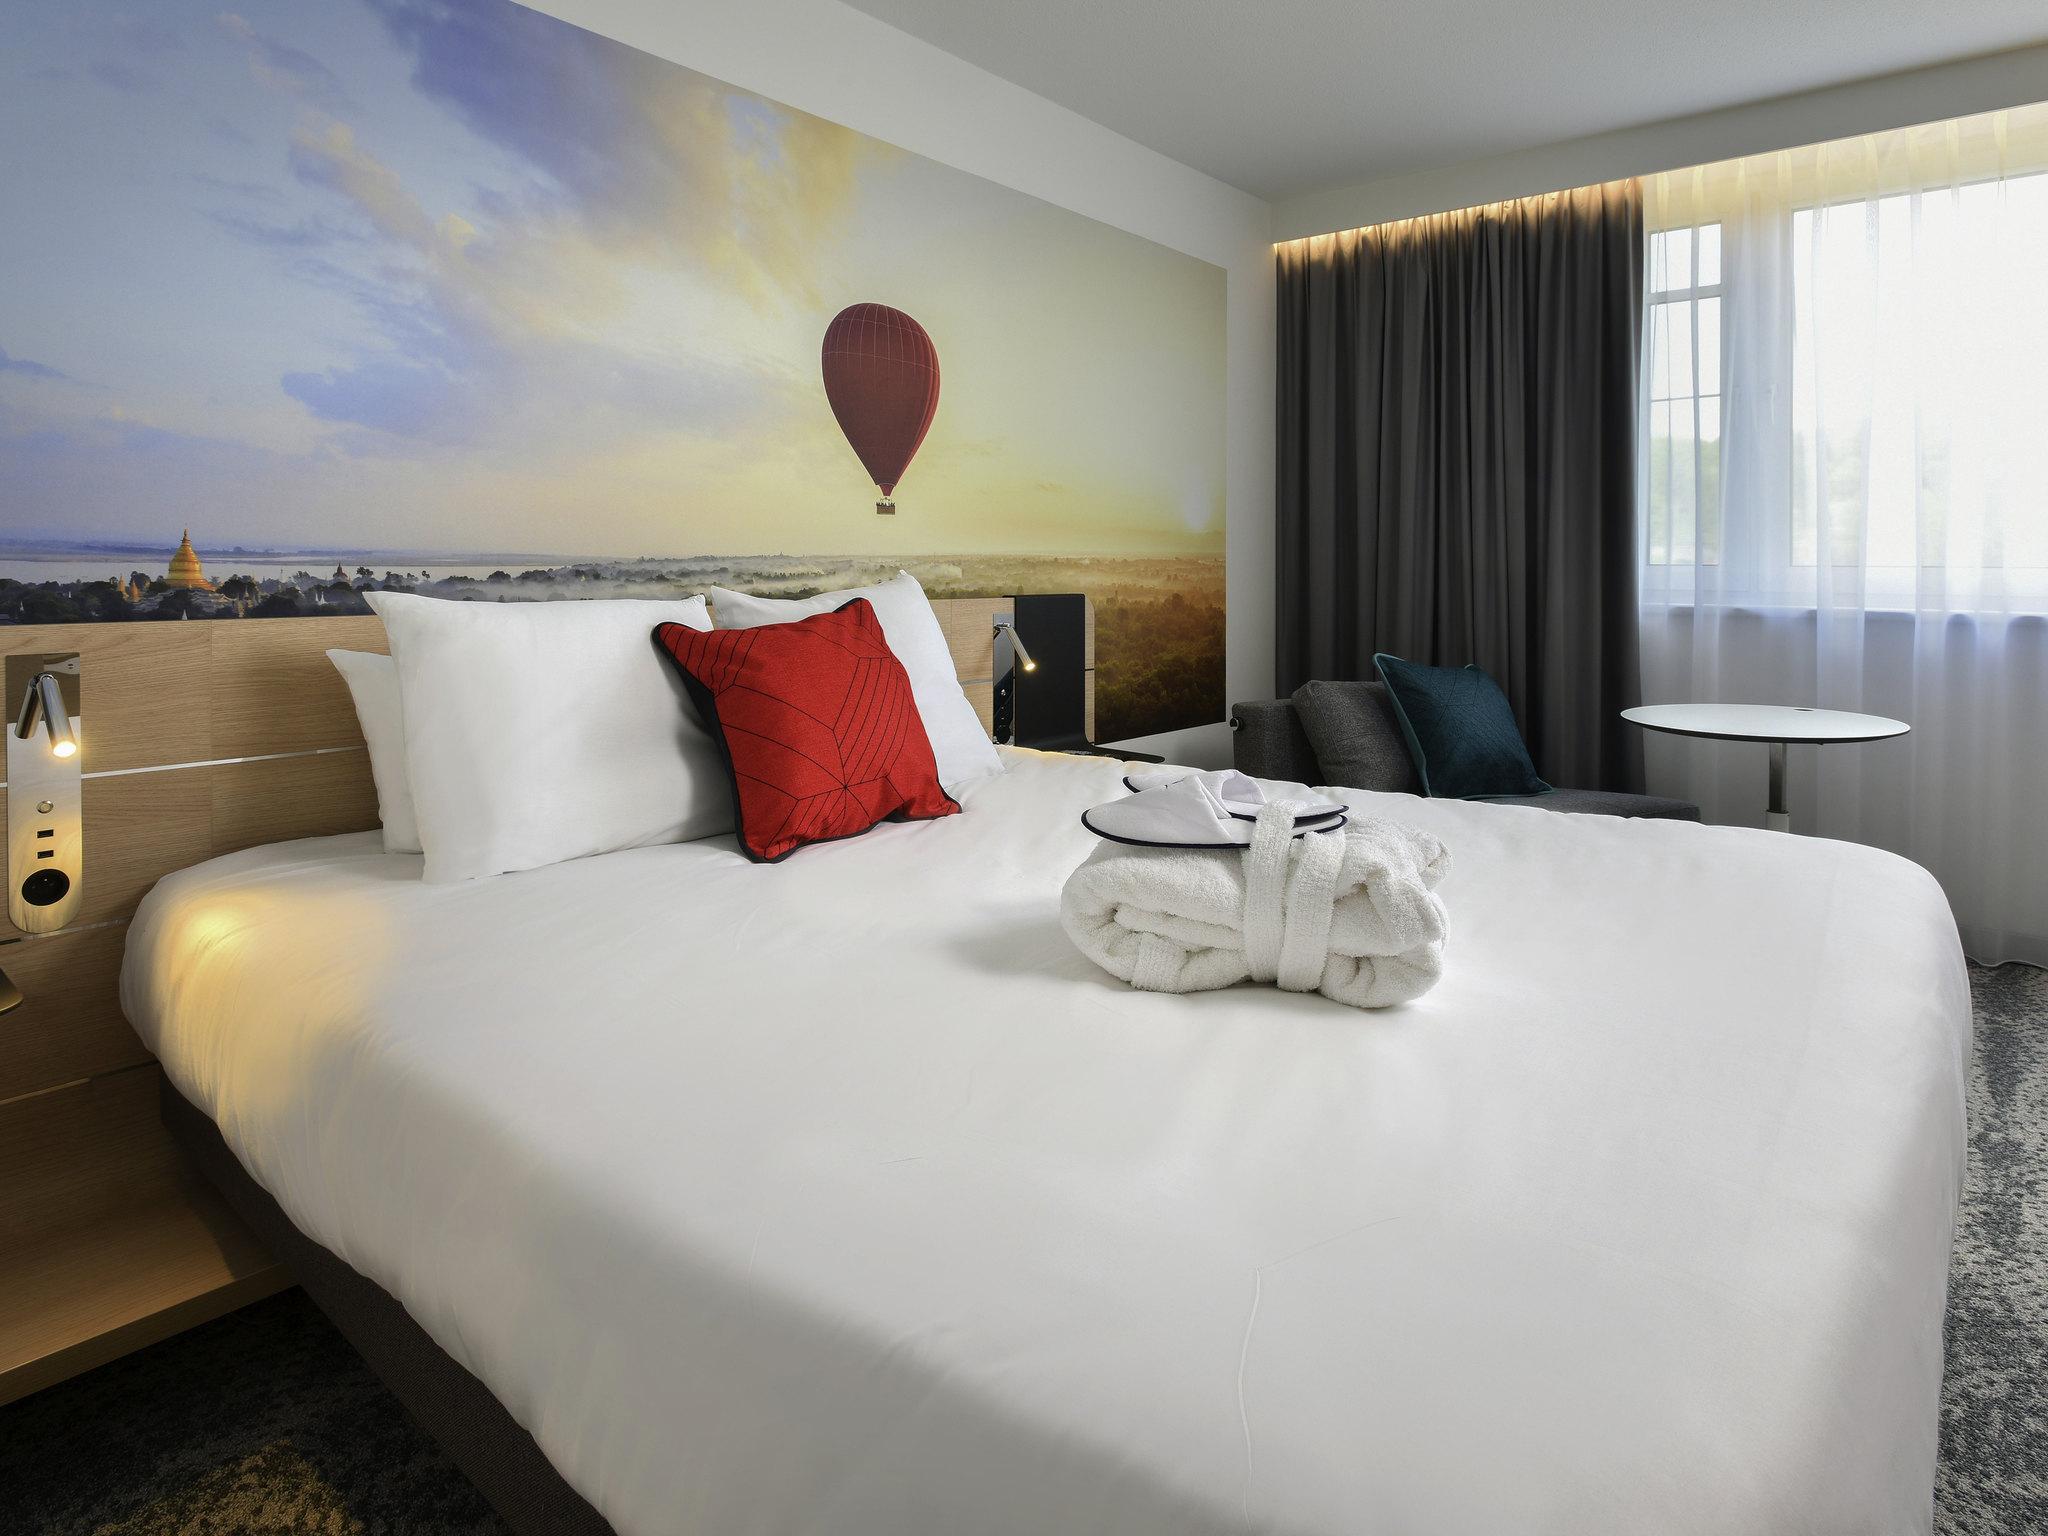 Hotel - Novotel Wavre Brussels East